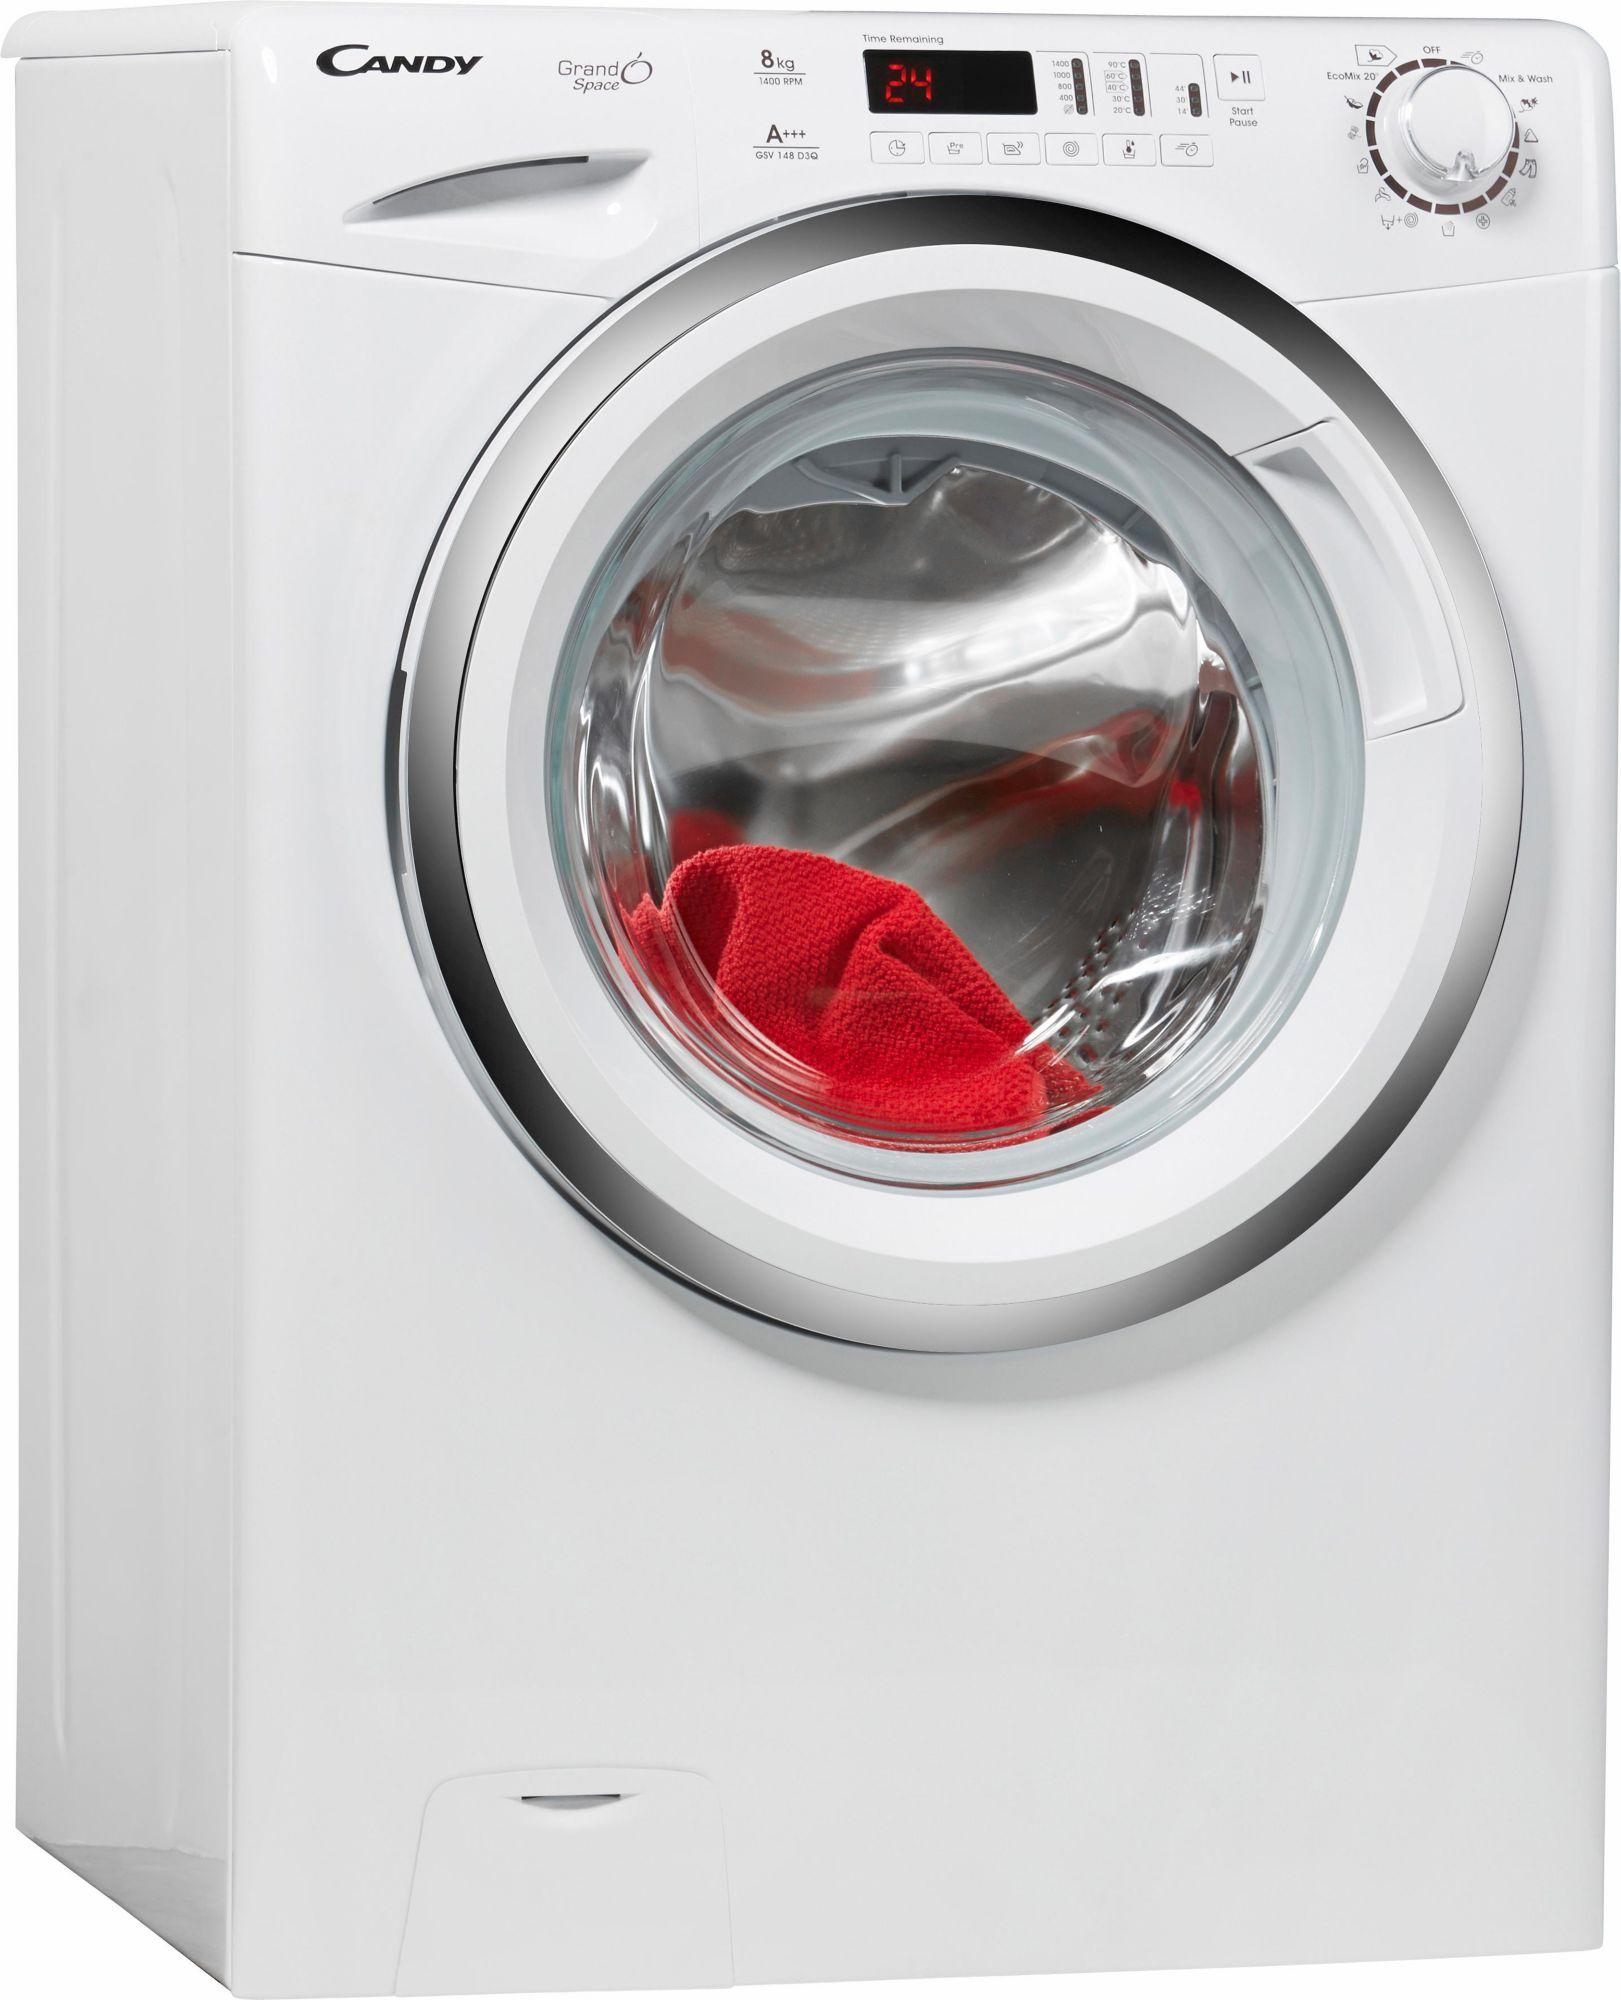 CANDY Candy Waschmaschine GSV 148D3Q-S, A+++, 8 kg, 1400 U/Min